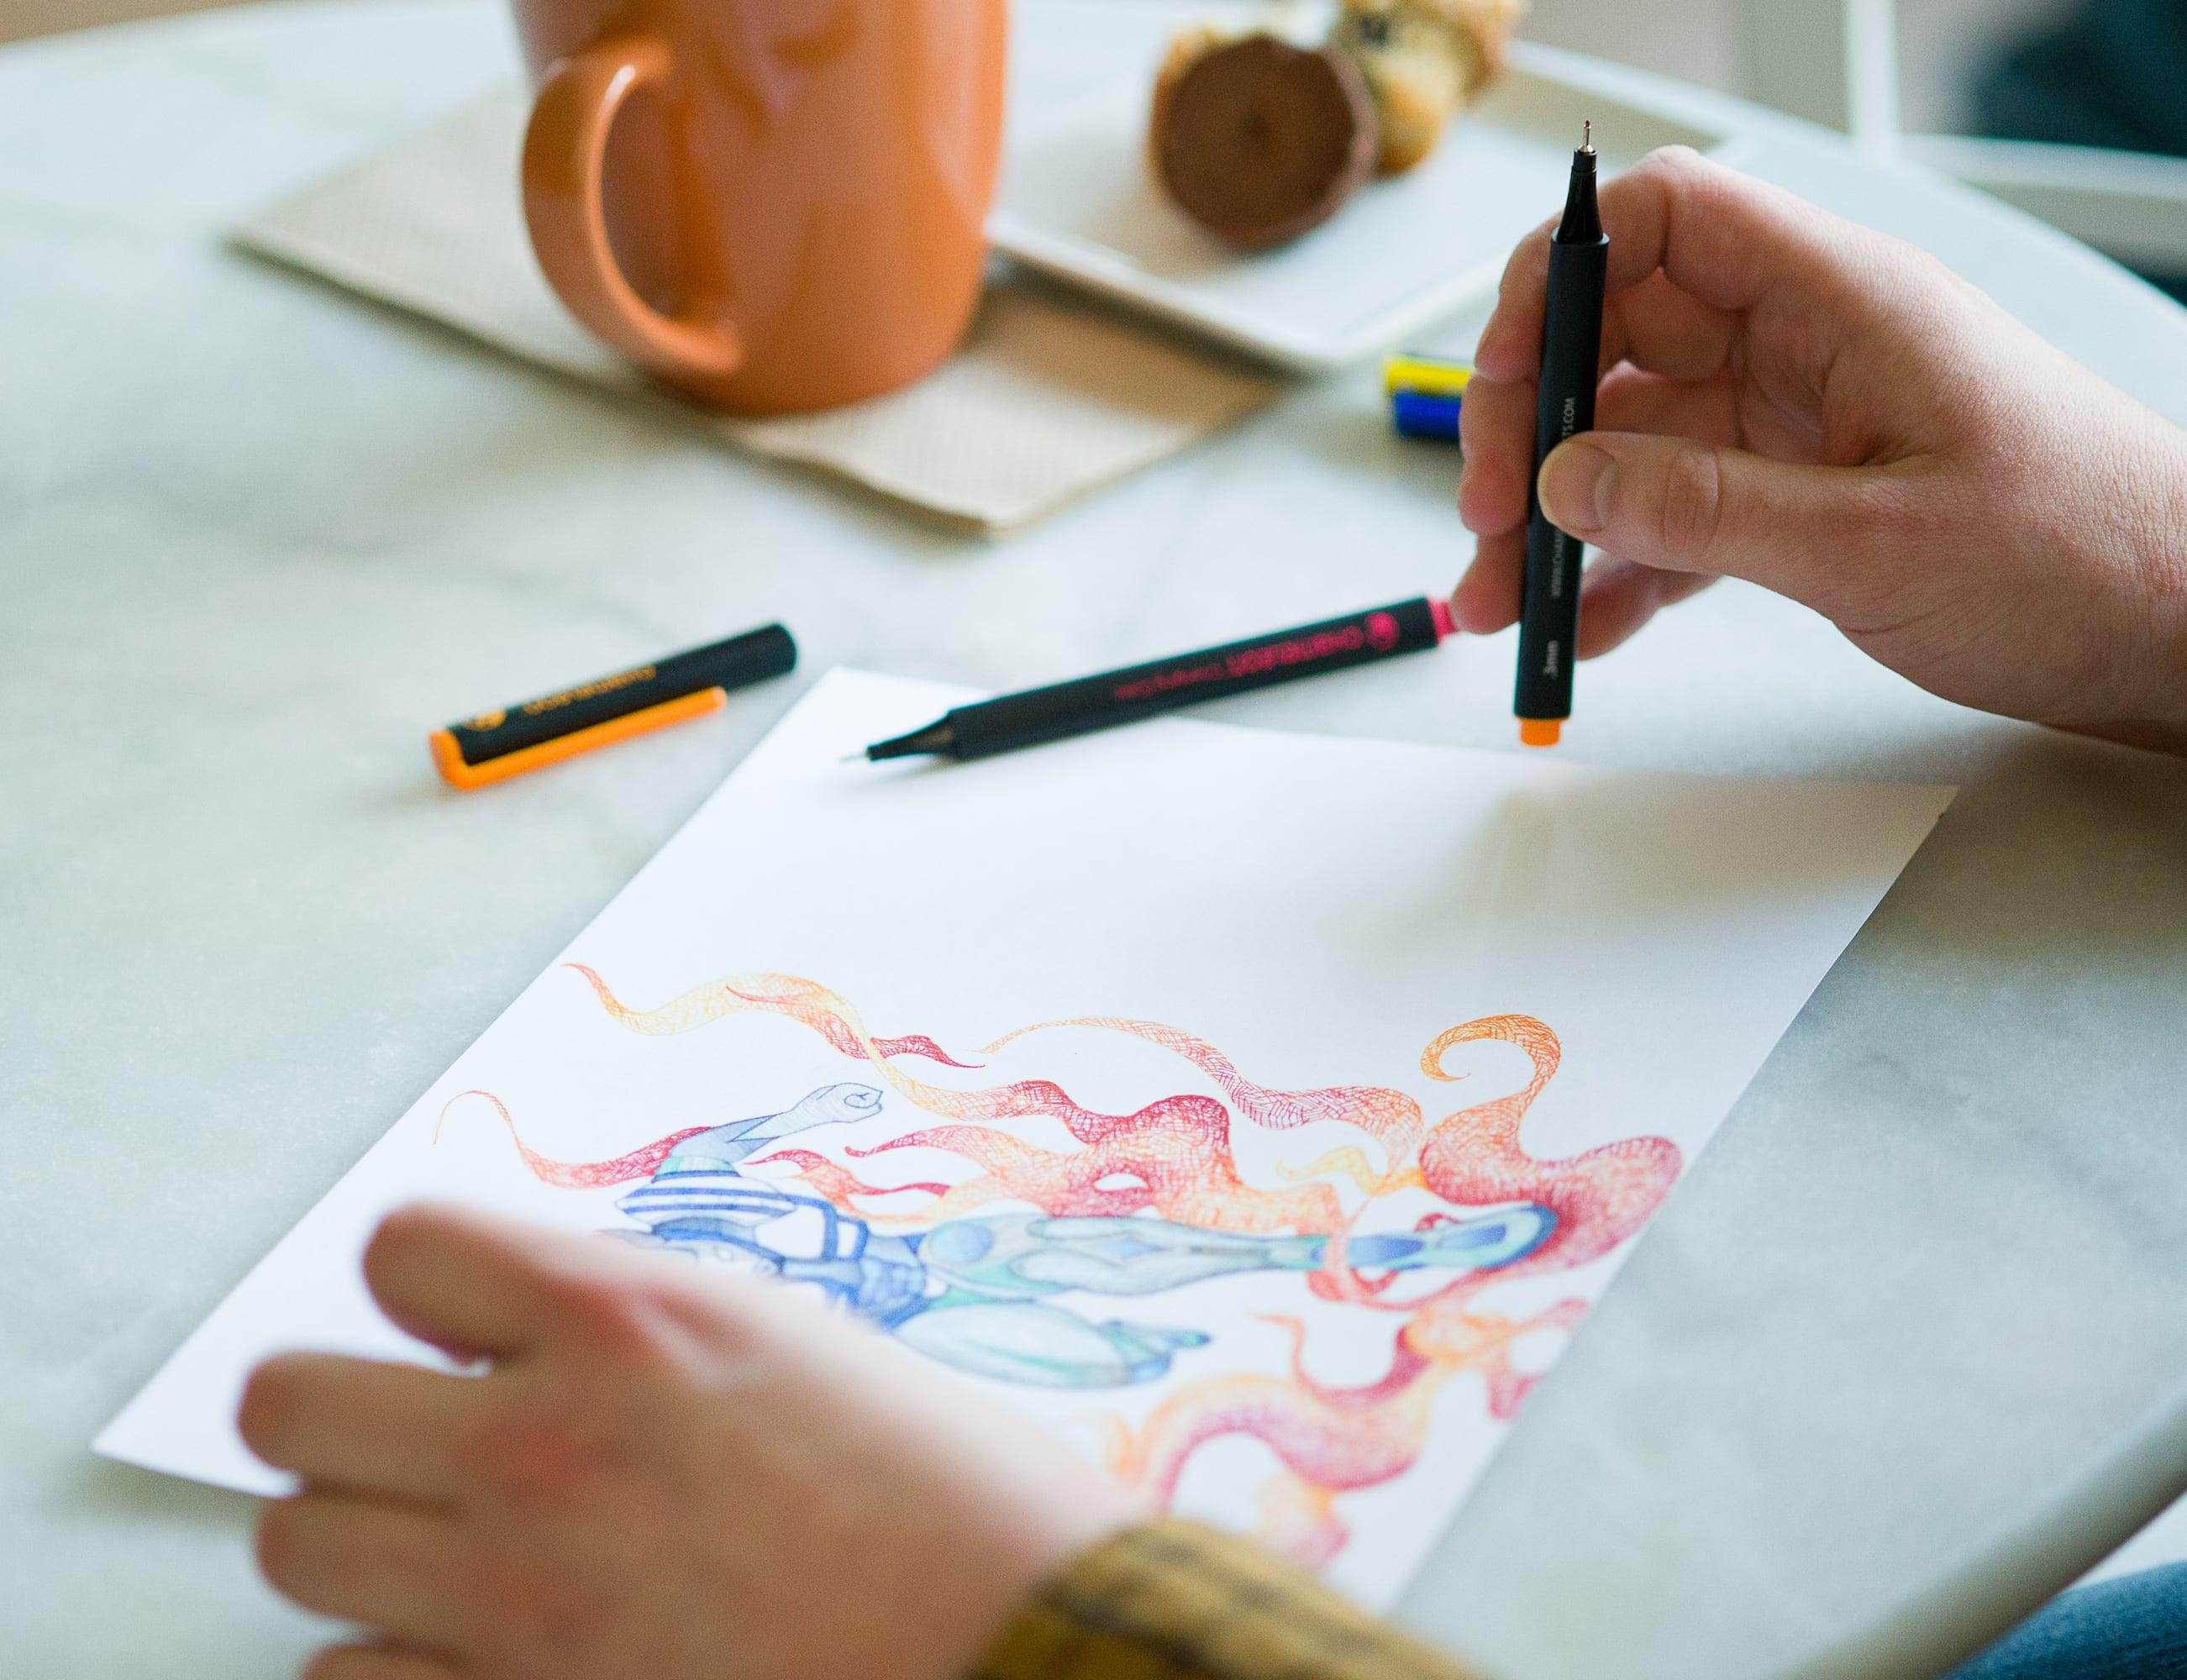 Chameleon Fineliners Revolutionary Color Blending Pens offer 1128 color combinations